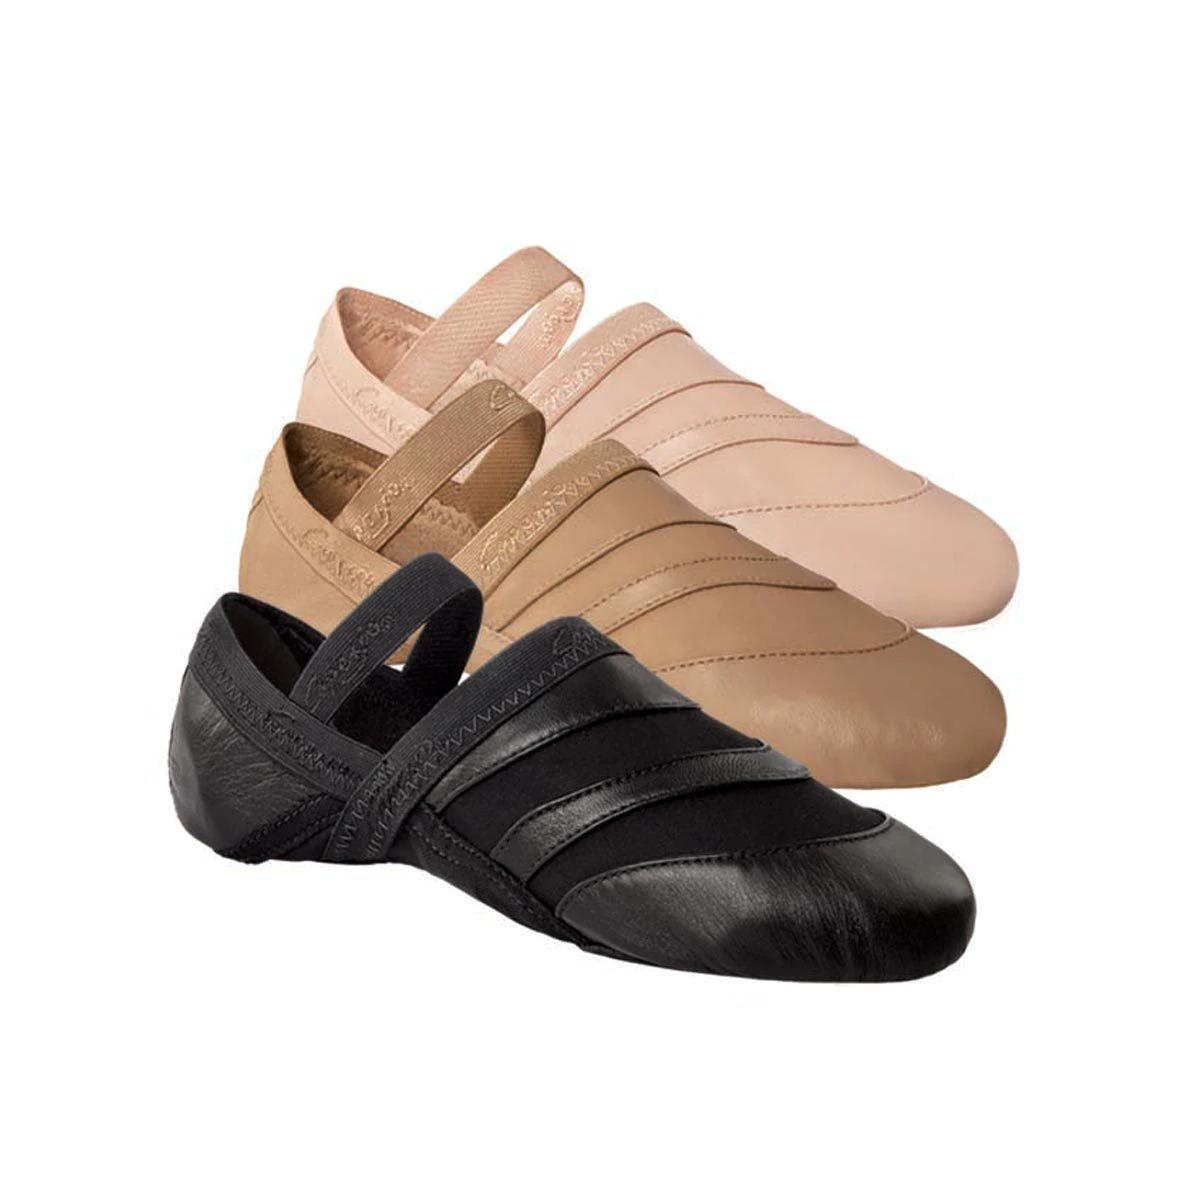 Capezio freeform FF01 split sole lyrical ballet shoes - caramel / black / pink